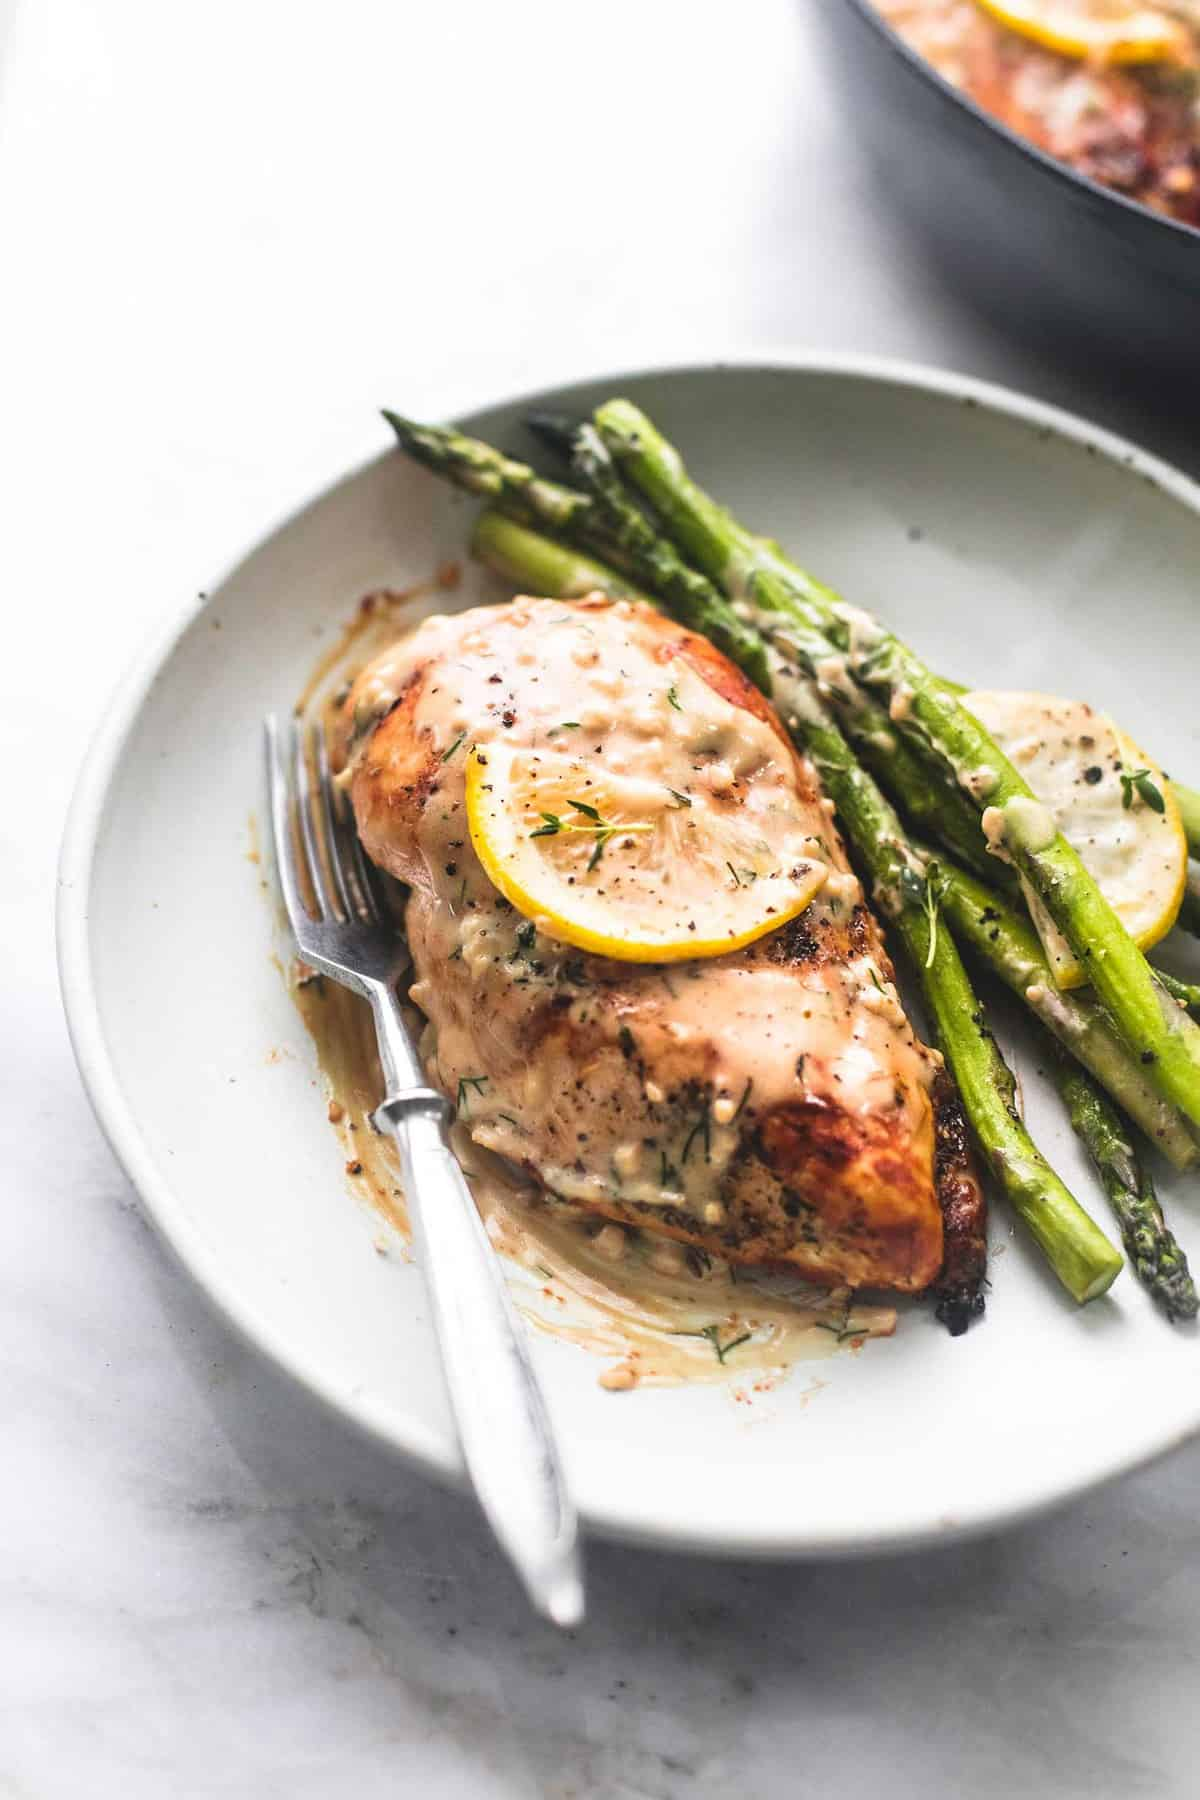 Easy One Pan Creamy Lemon Chicken and Asparagus Dinner Recipe | lecremedelacrumb.com